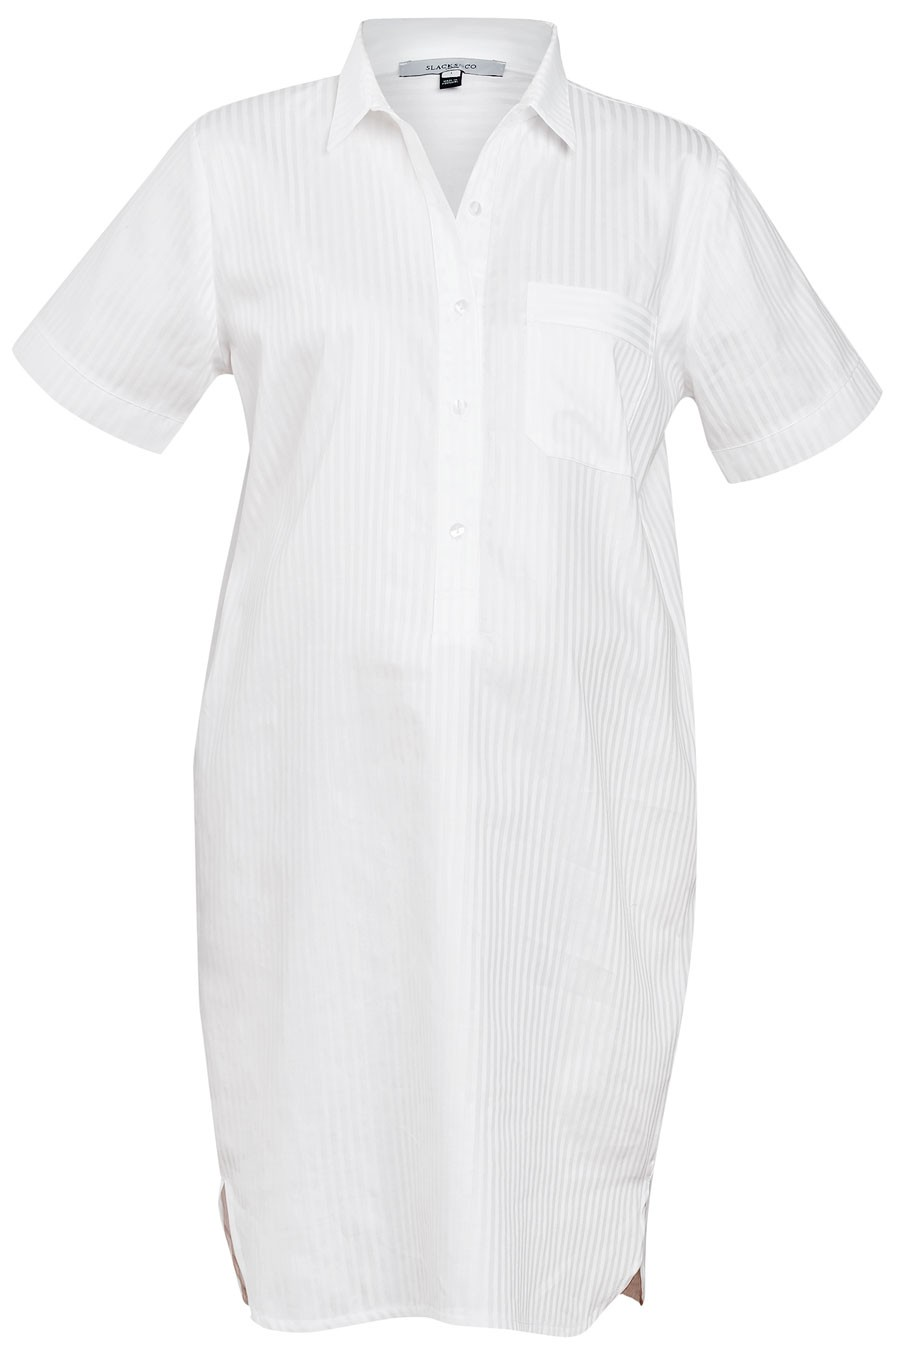 NIGHTSHIRT Shortsleeve Cotton